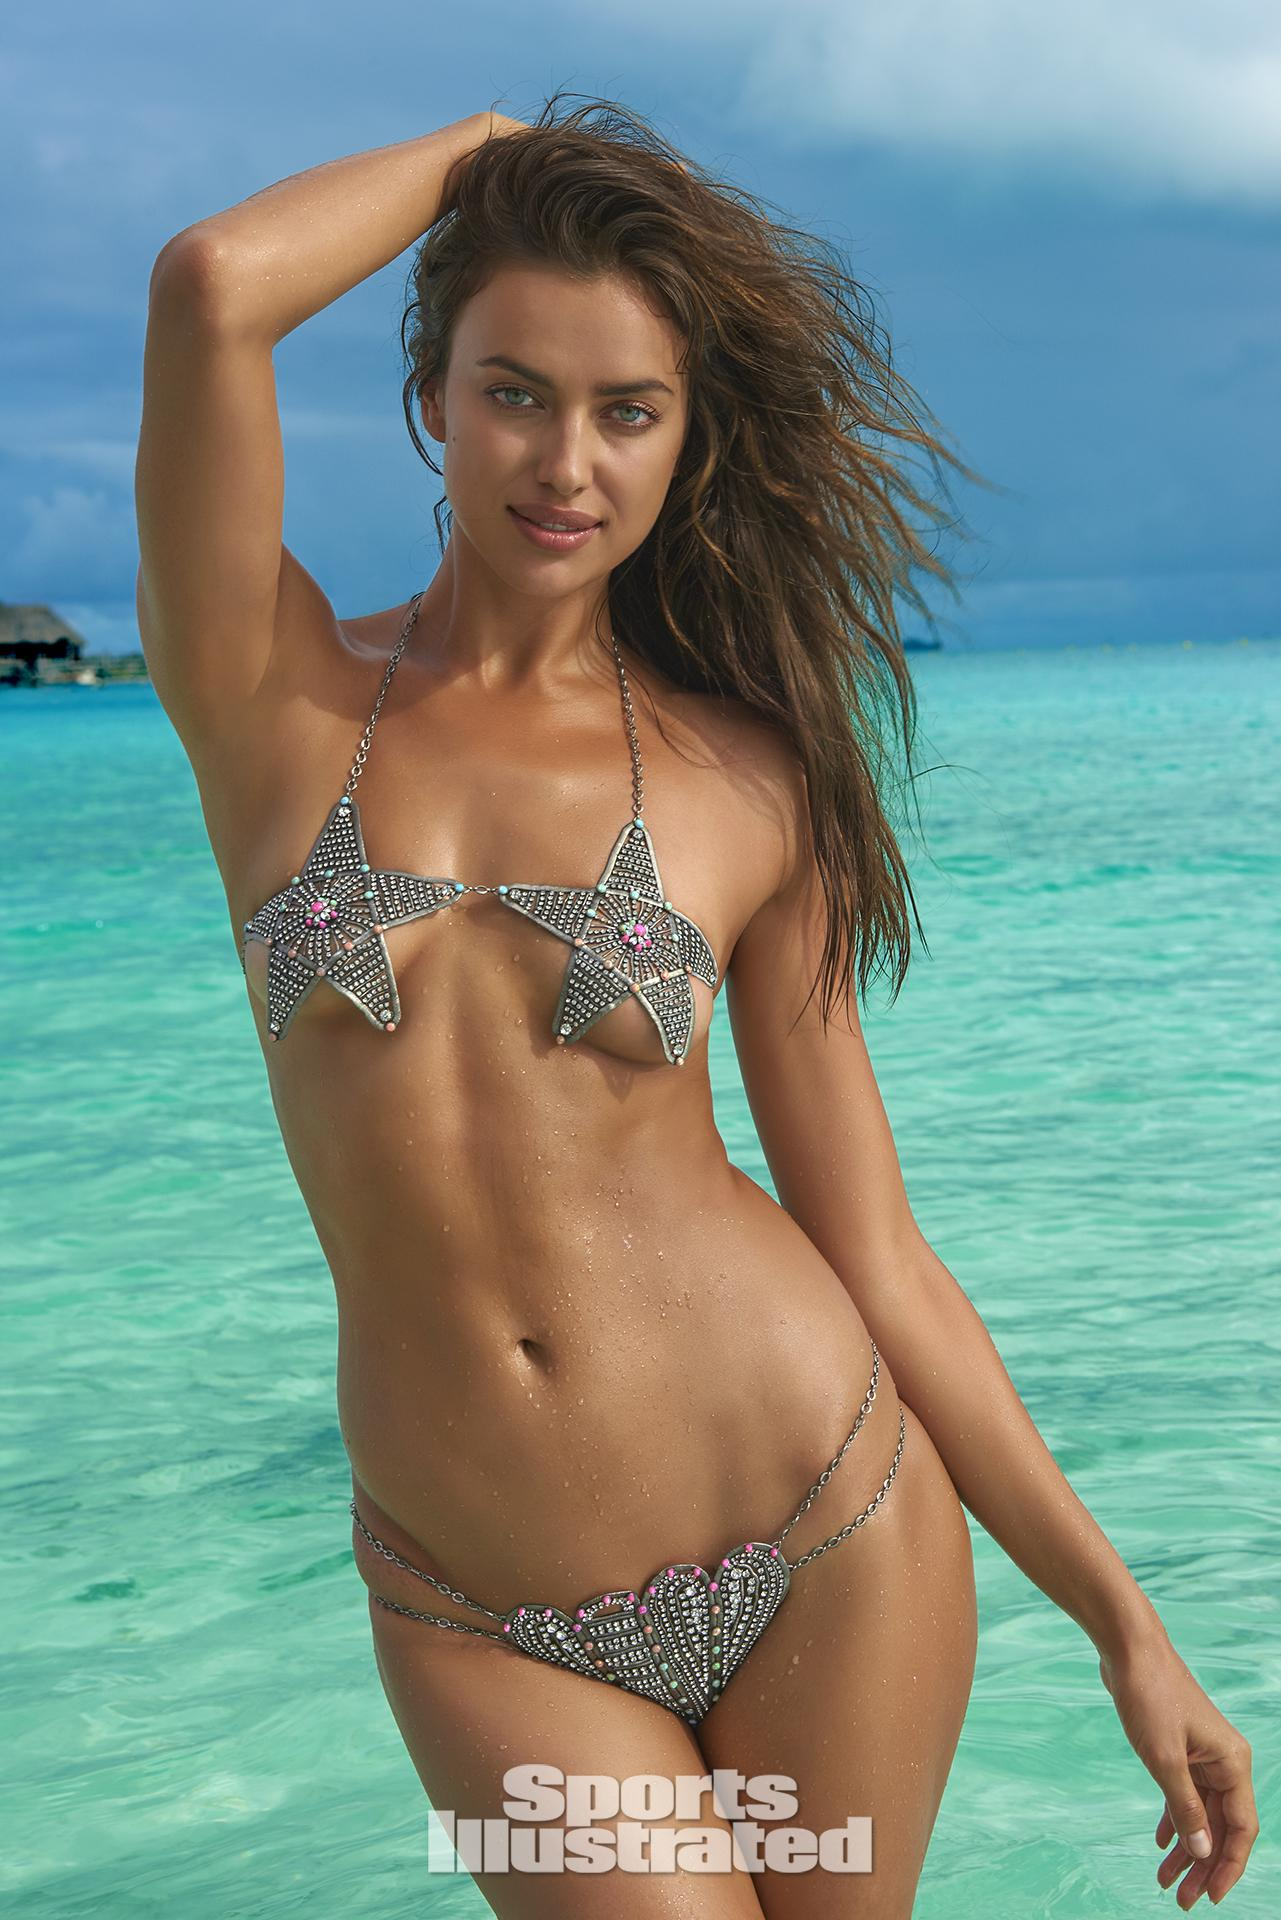 Irina Shayk 2016 nudes (55 images) Sideboobs, Facebook, braless